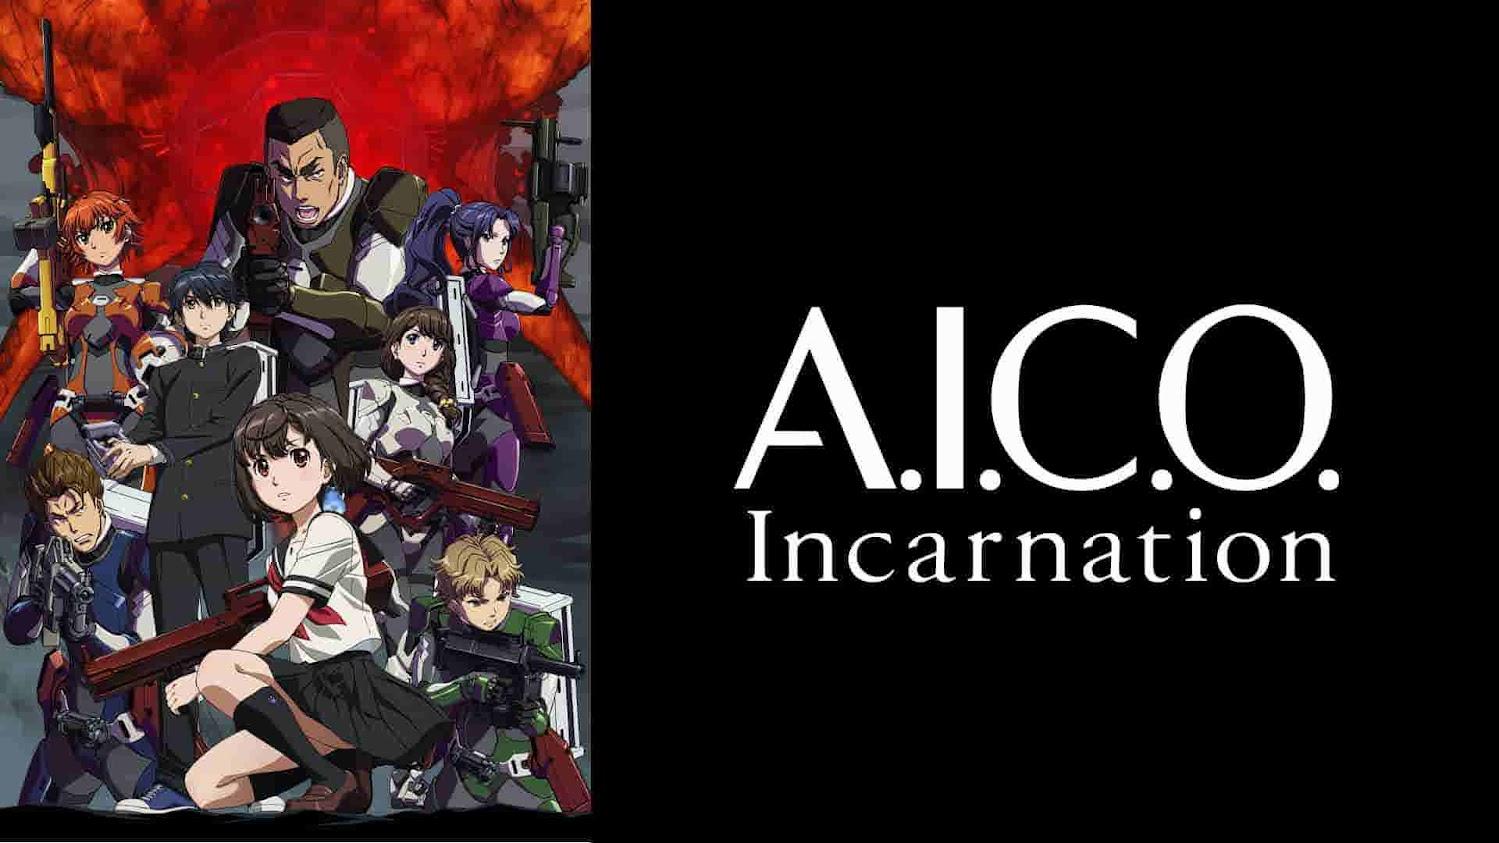 A.I.C.O. Incarnation|全話アニメ無料動画まとめ